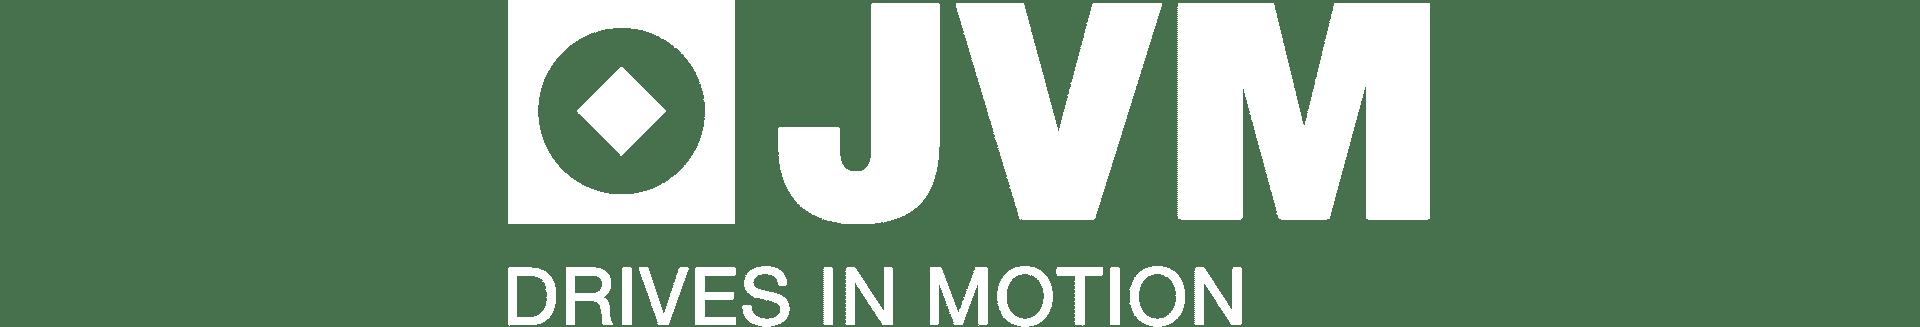 JVM Logo White